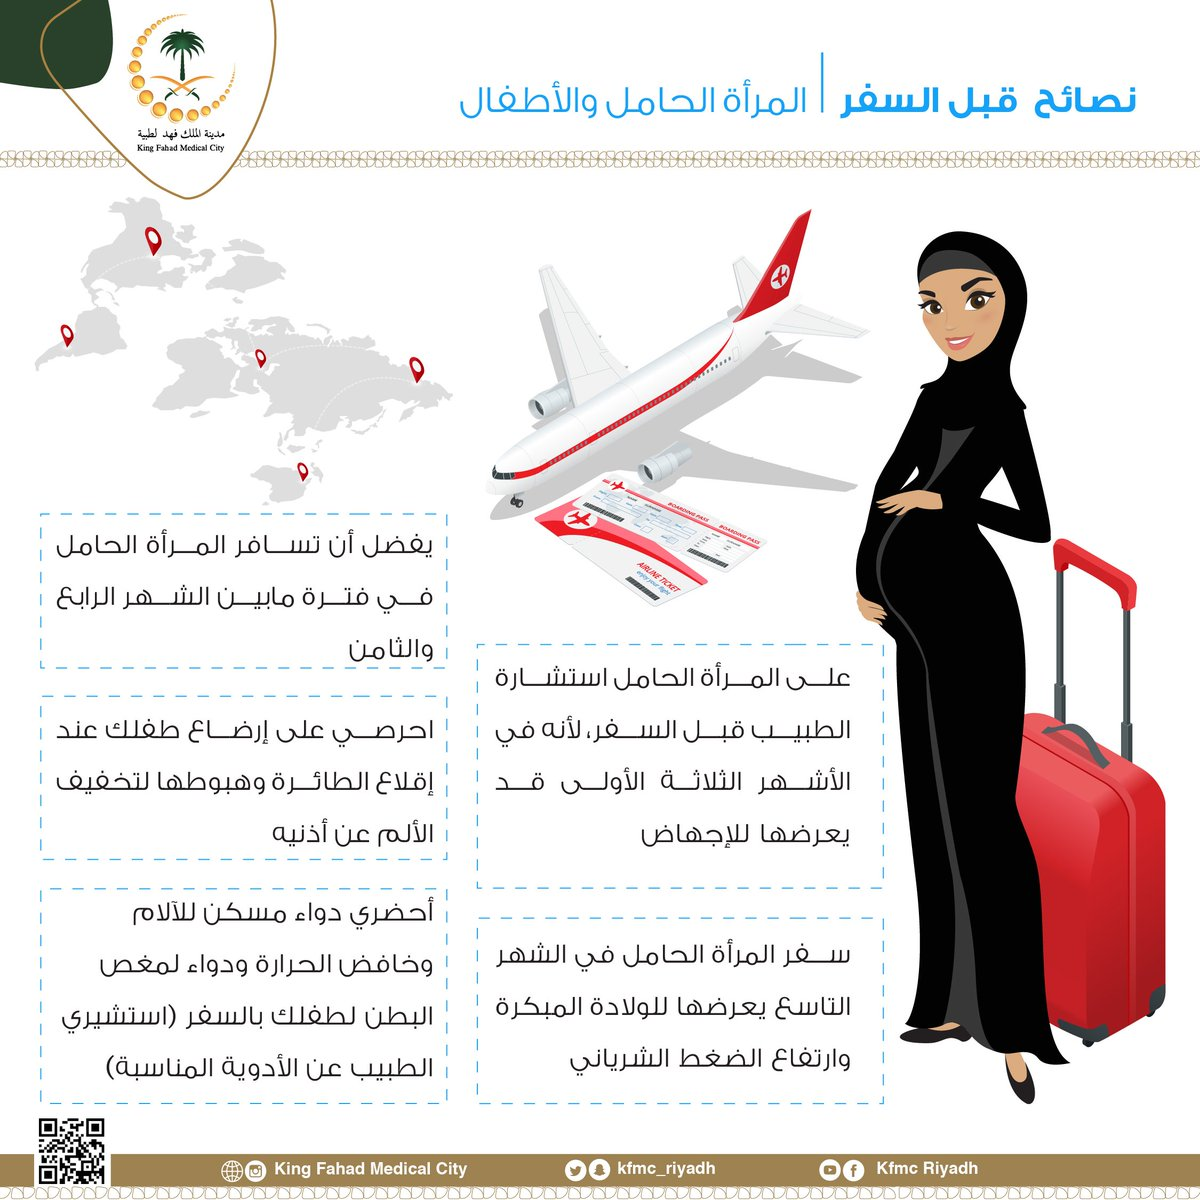 c3acec1e6fa28 خدمات وإرشادات تعليمية لسفر أمن -أرضى - جوى - بحرى - منتدى فتكات